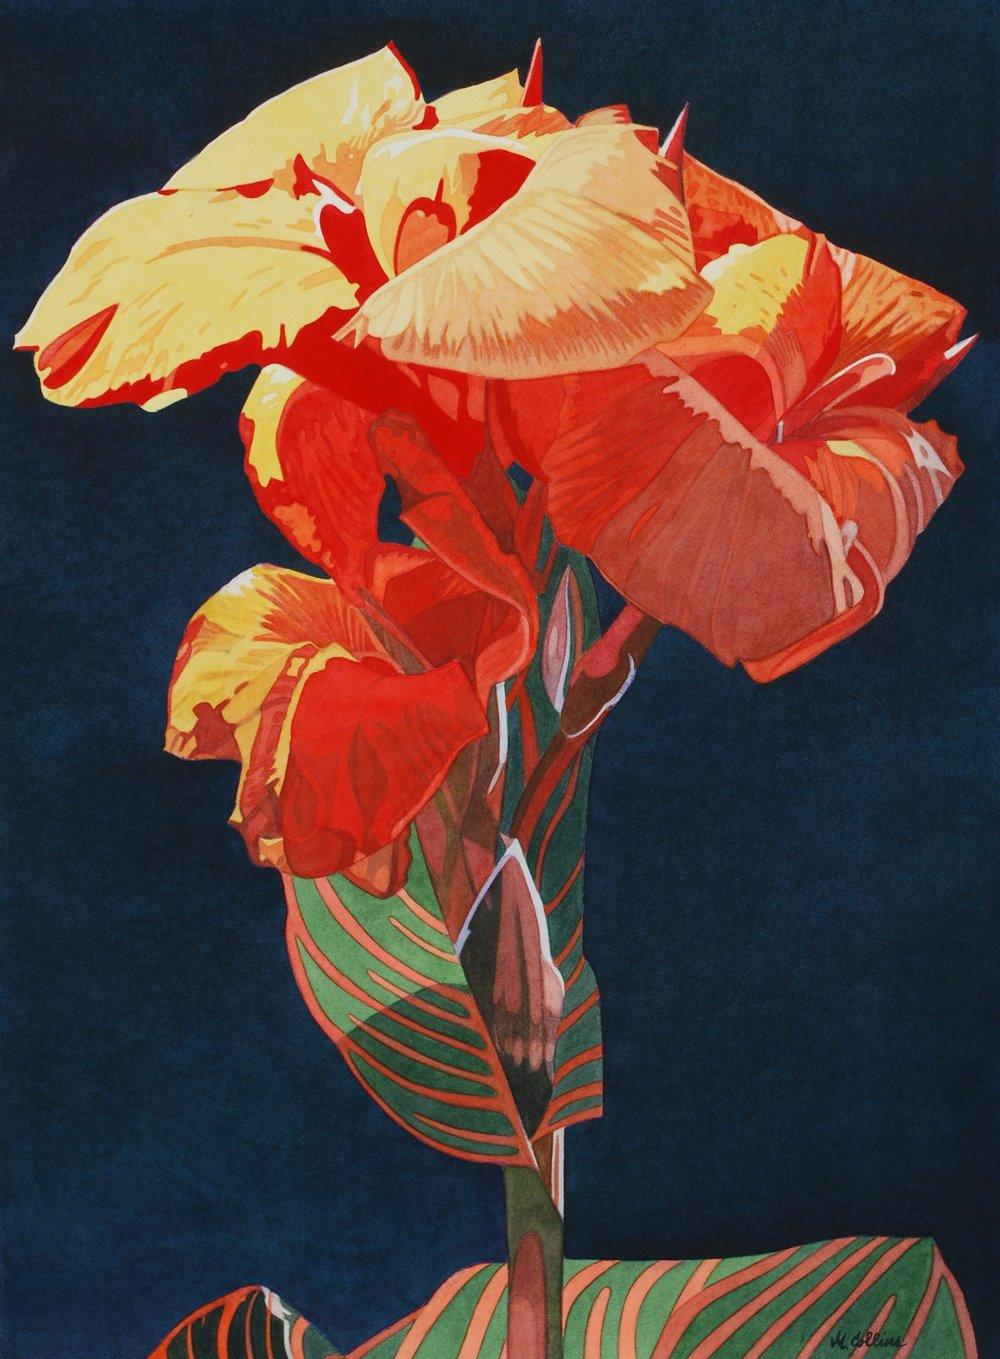 Marjorie Collins, Canna II, Watercolour, 97 x 75 x 2,  http://marjoriecollins.com